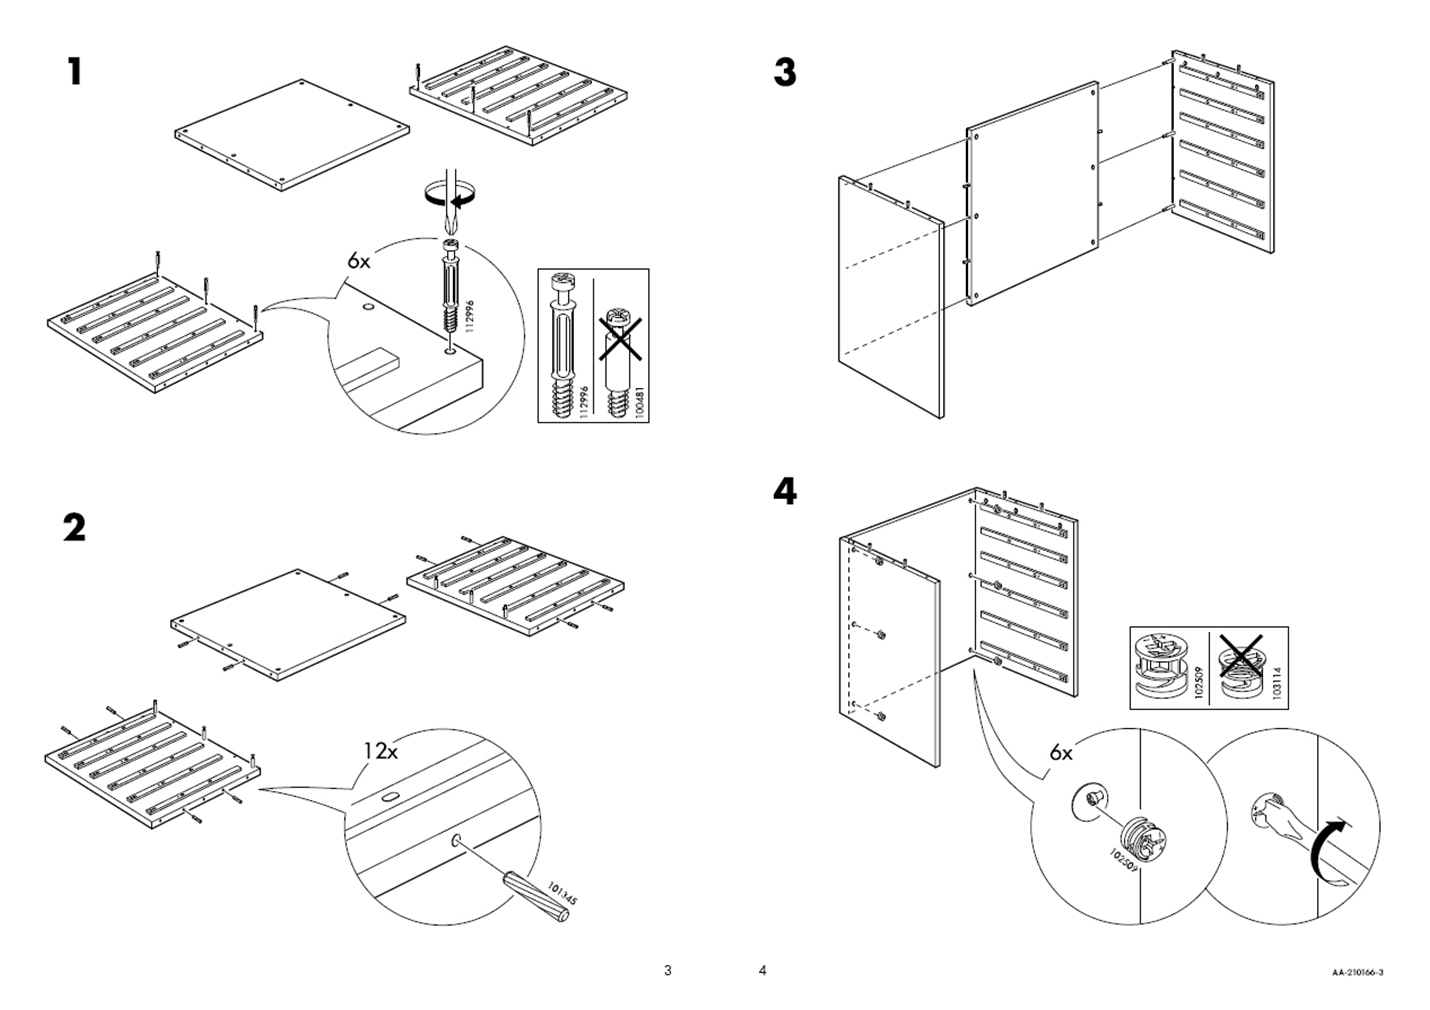 Ikea инструкции по сборке